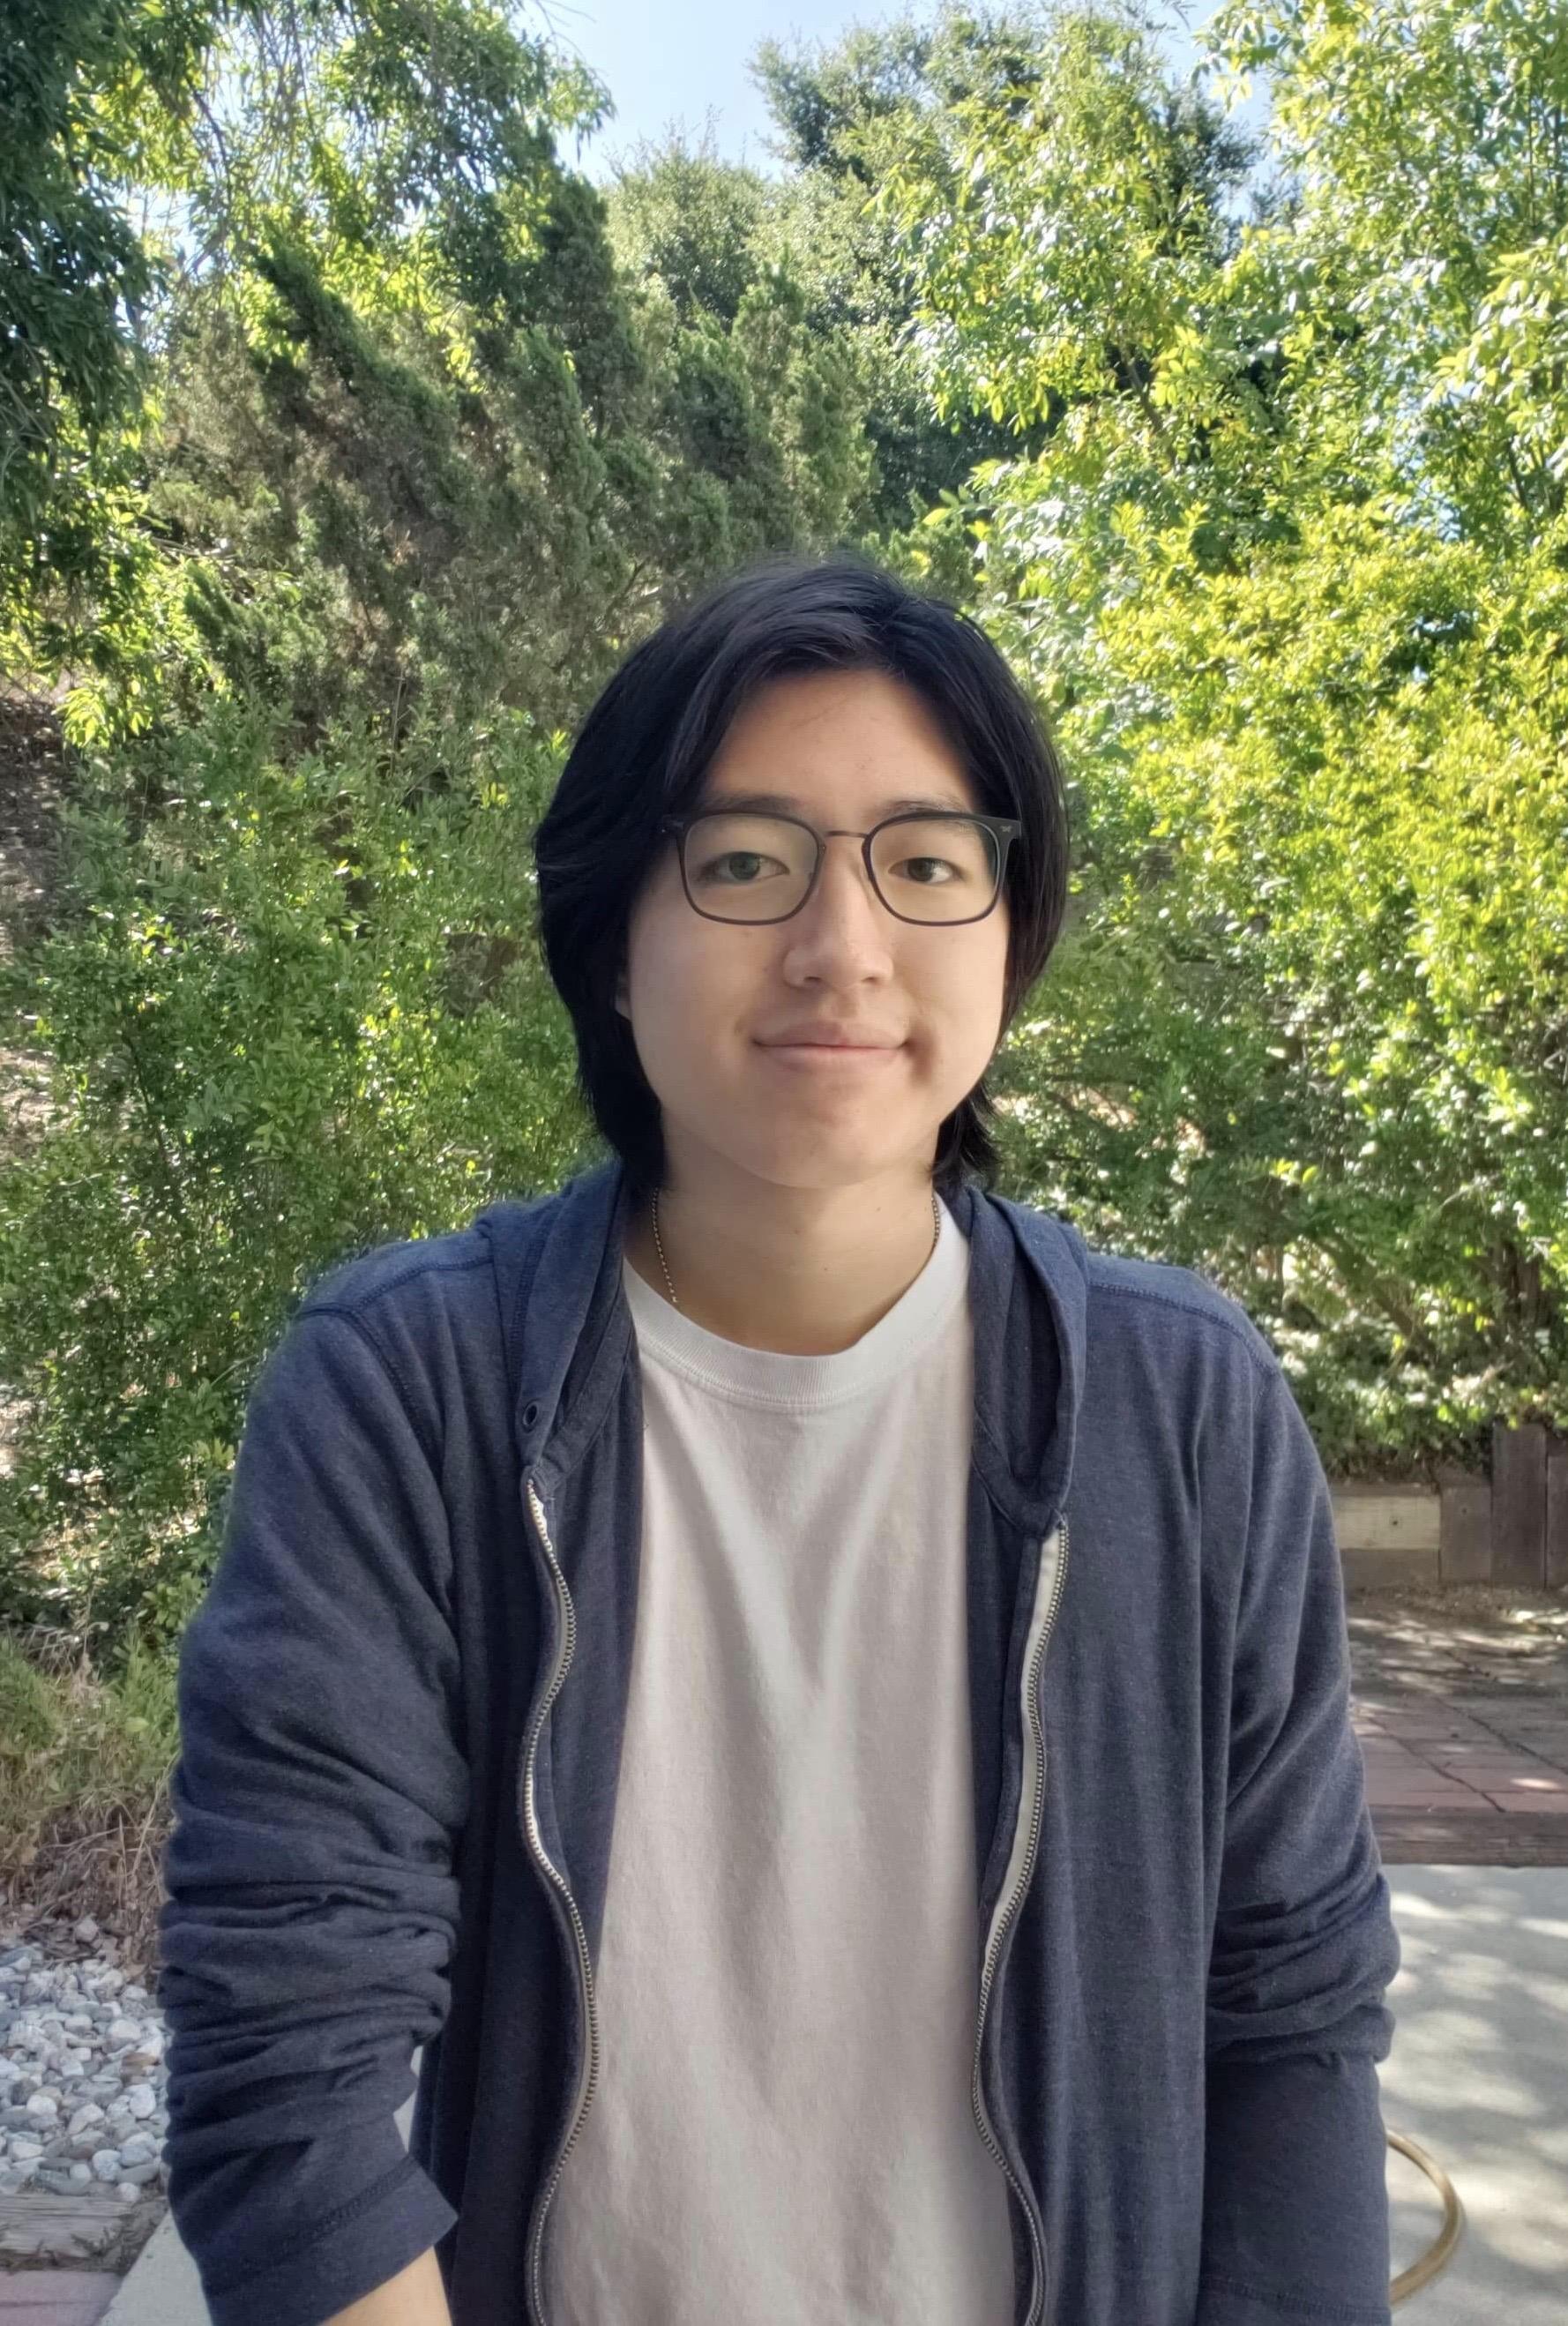 Daniel Hwang | Vice President